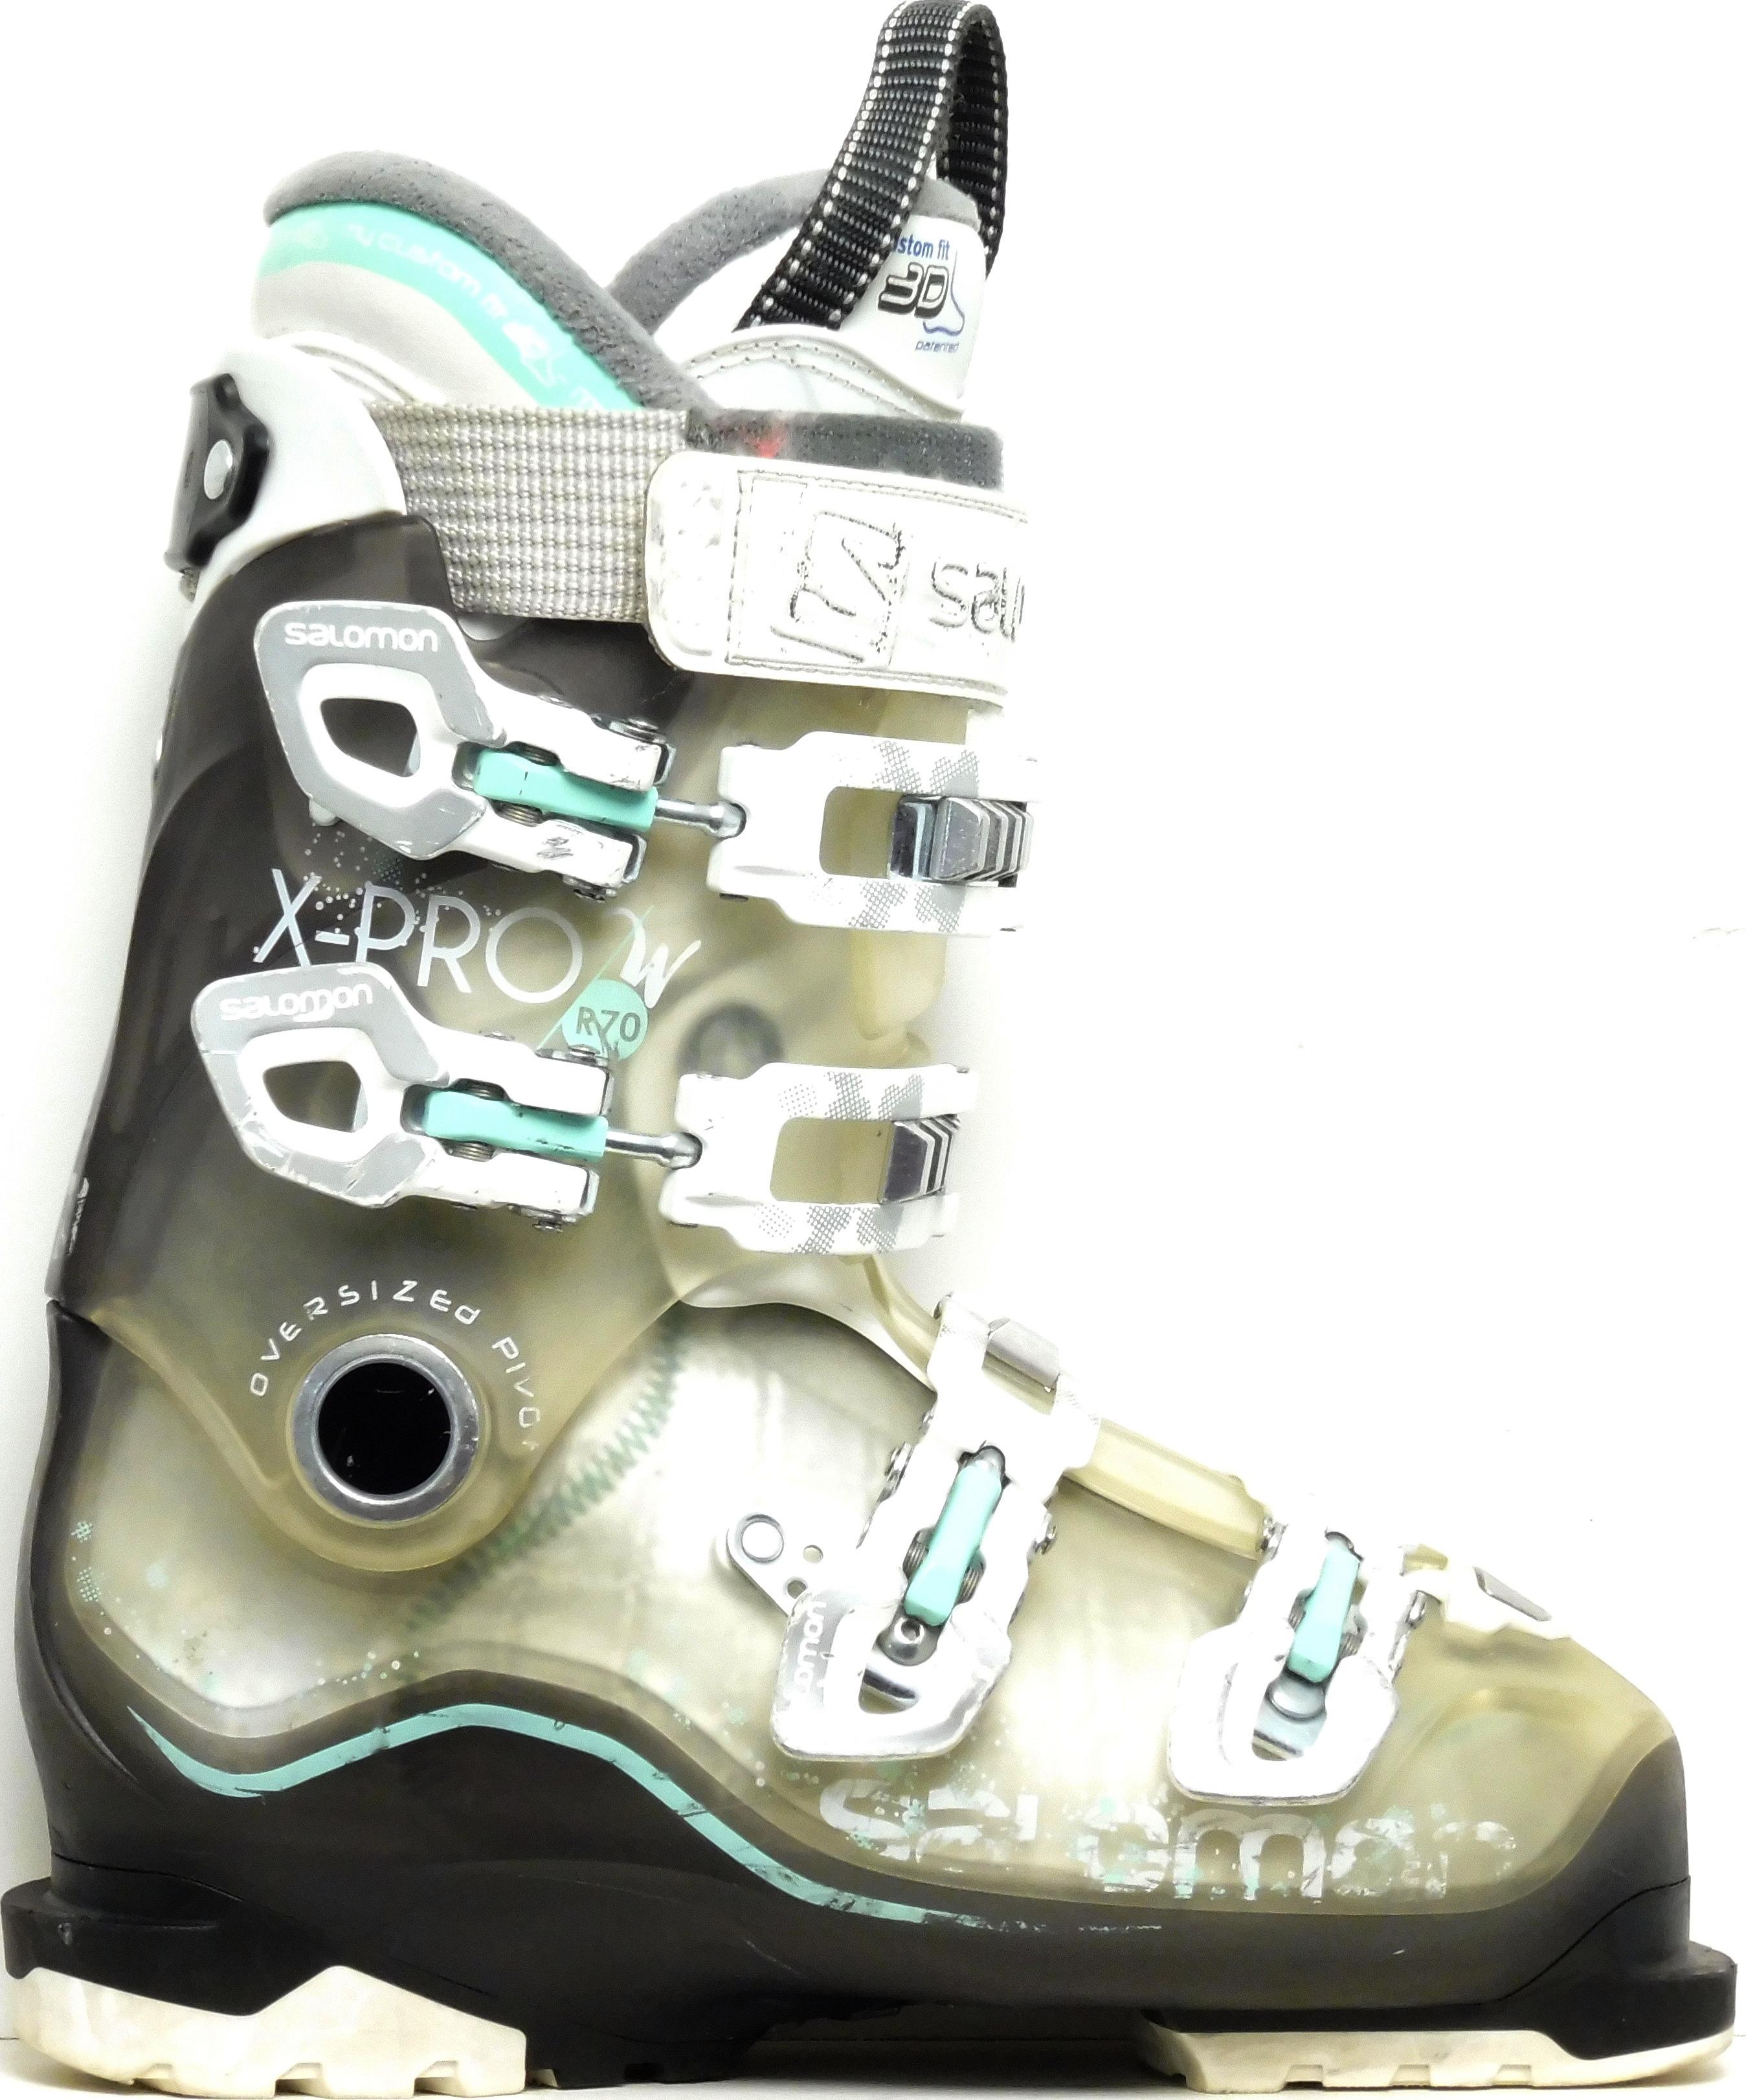 Salomon Dámske lyžiarky BAZÁR Salomon X-Pro R70 W 250 b98651801b9